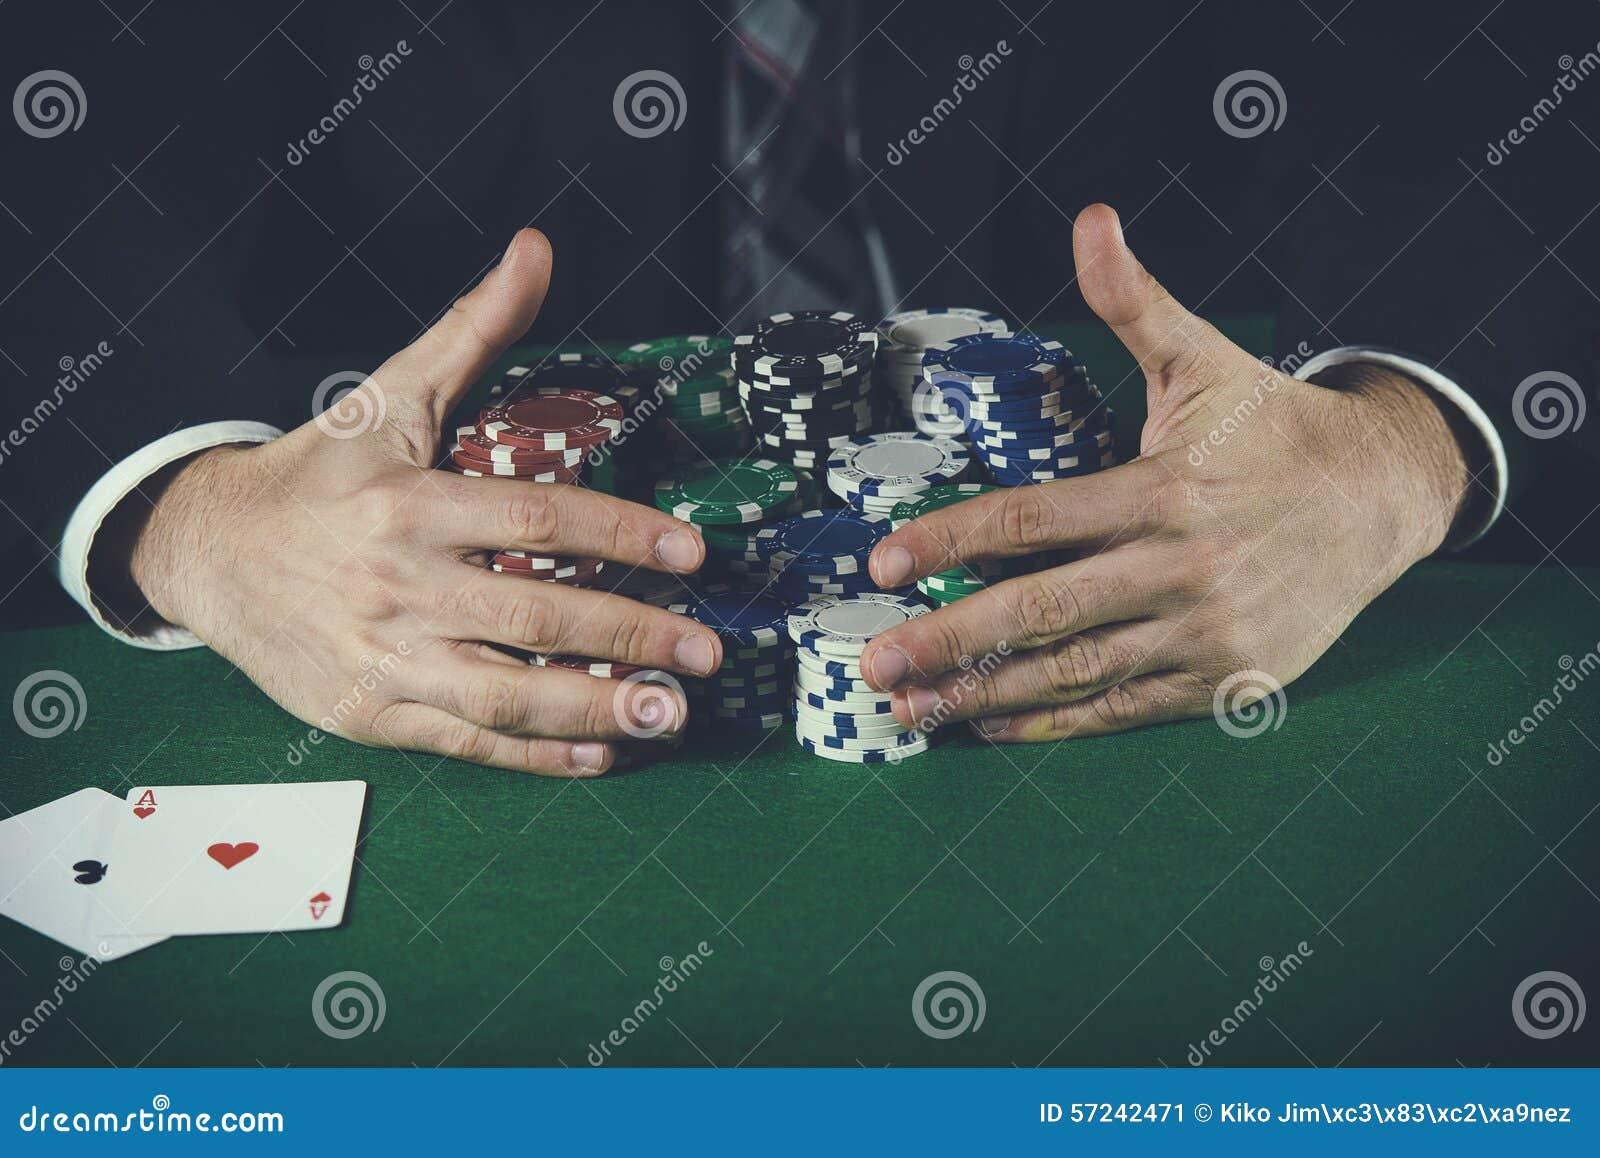 james bond 007 casino royale schauspieler